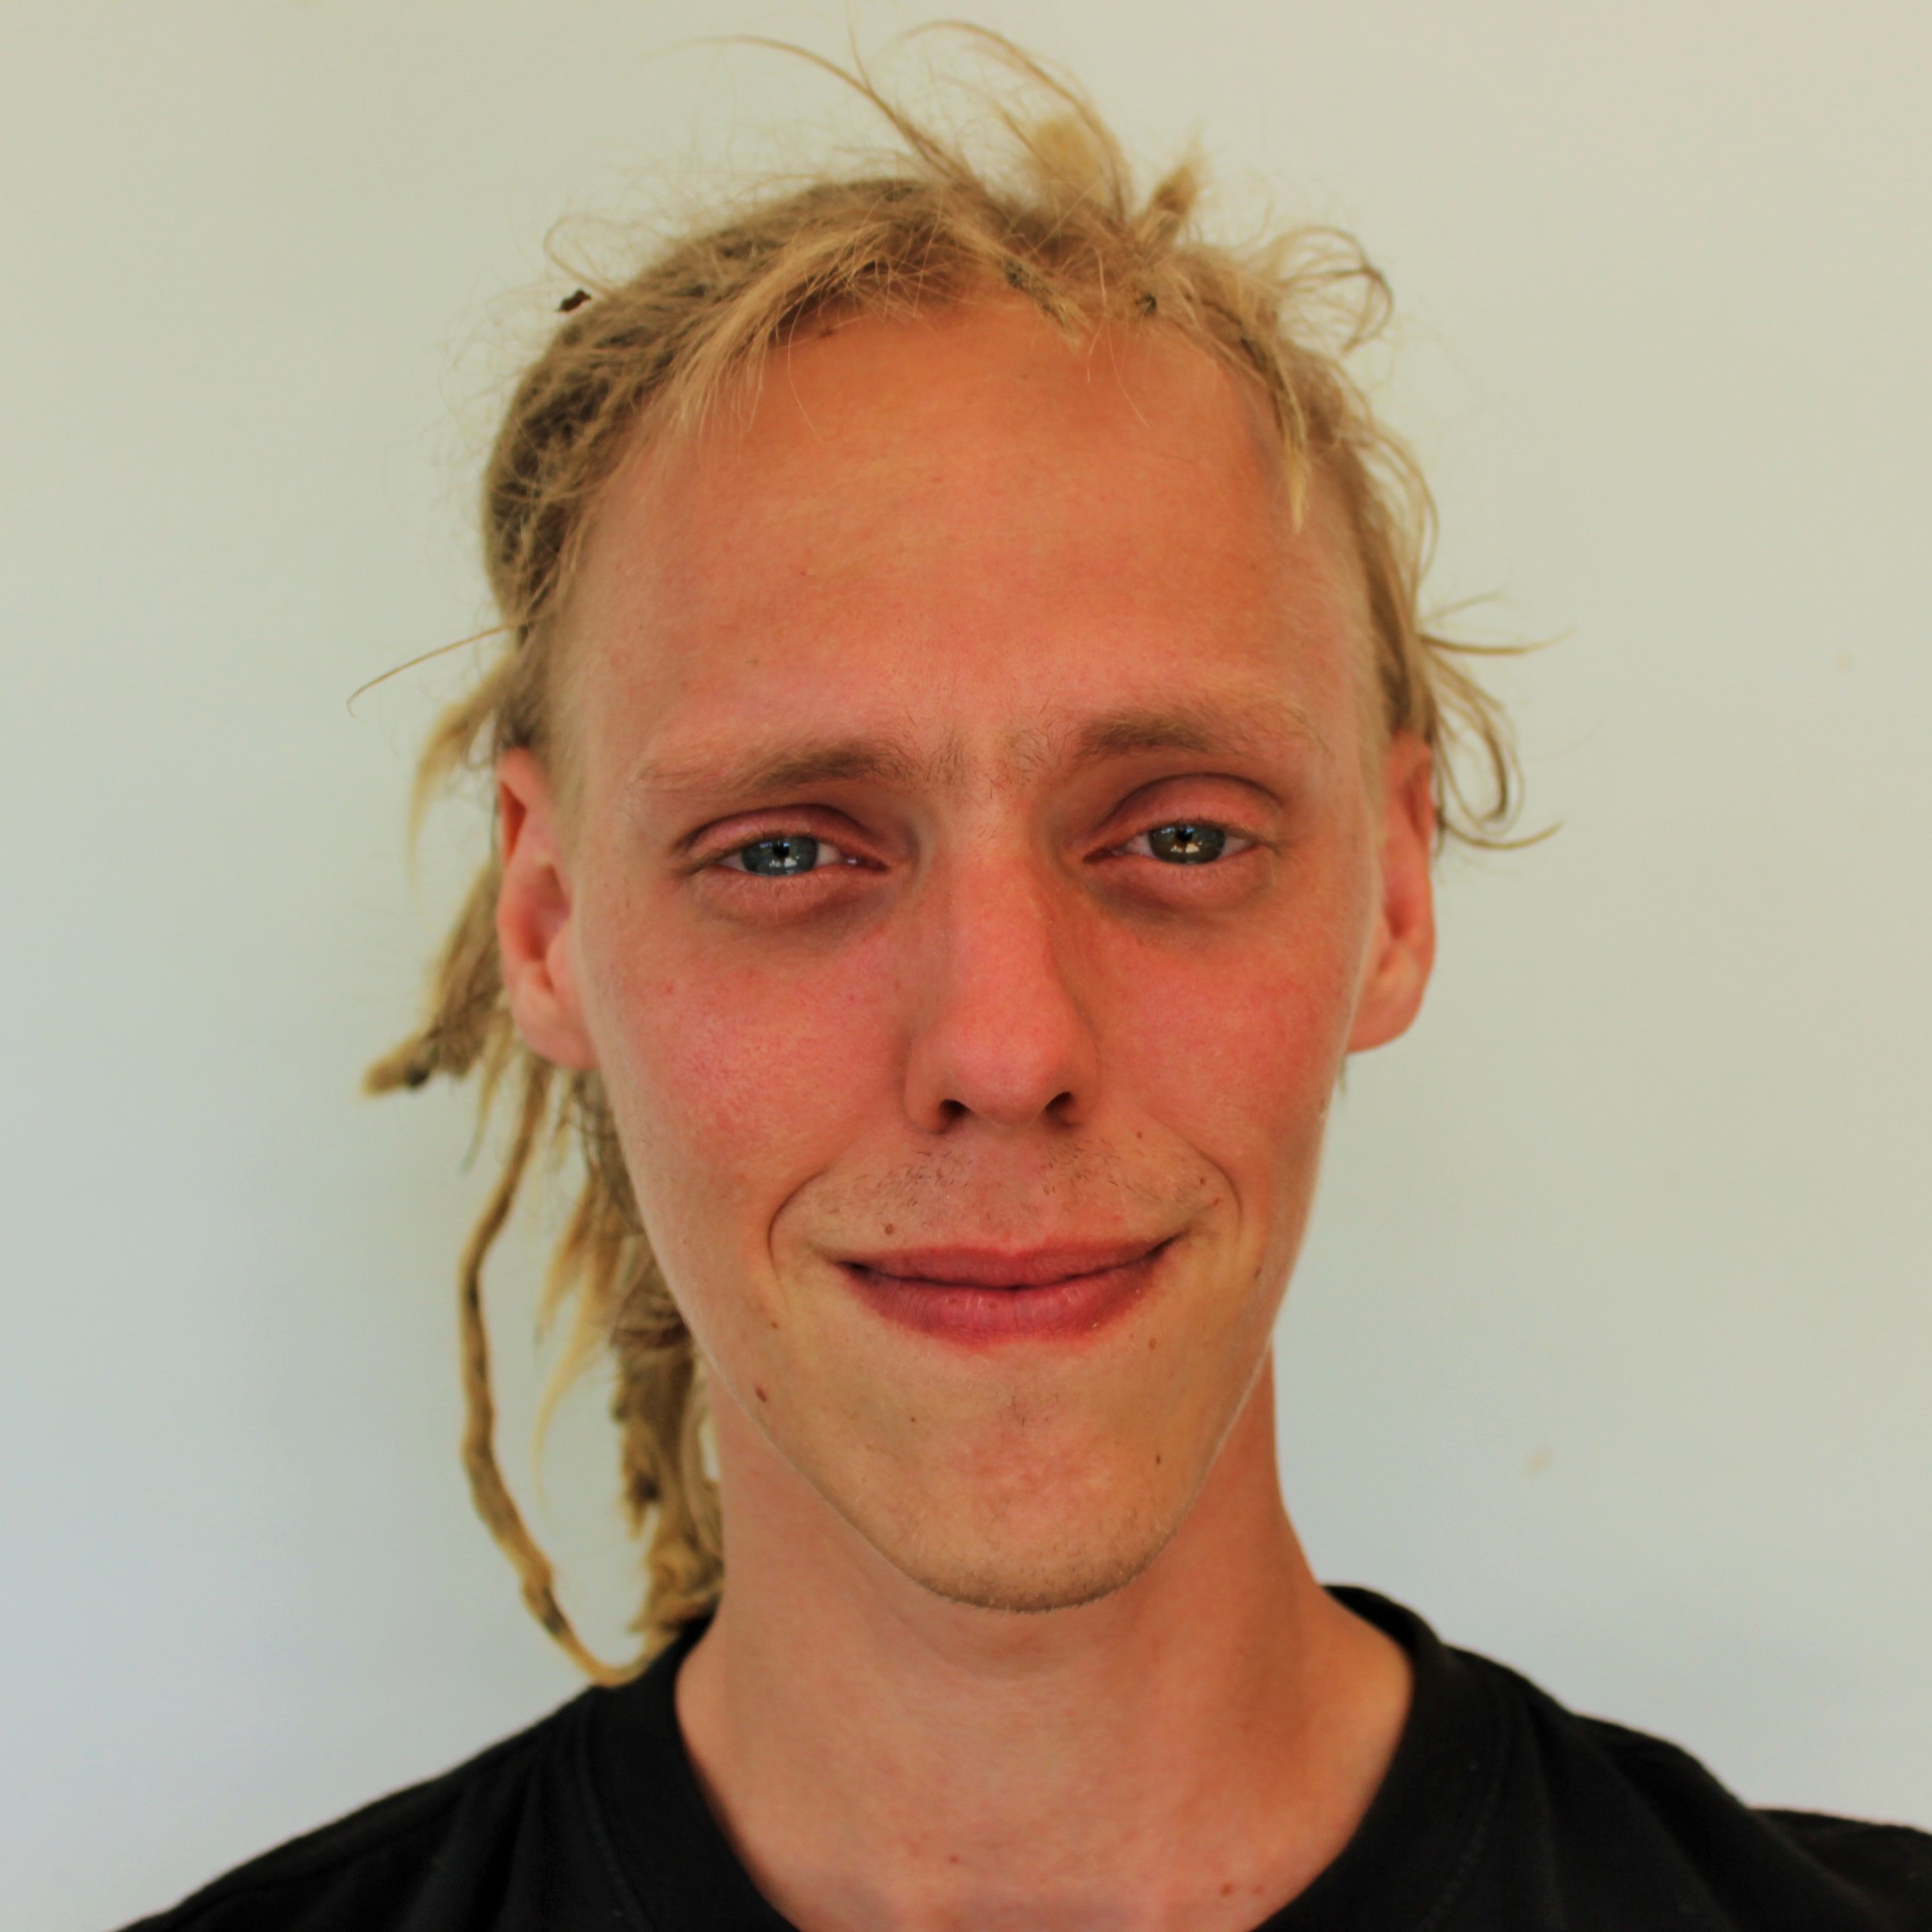 Christoph Kink